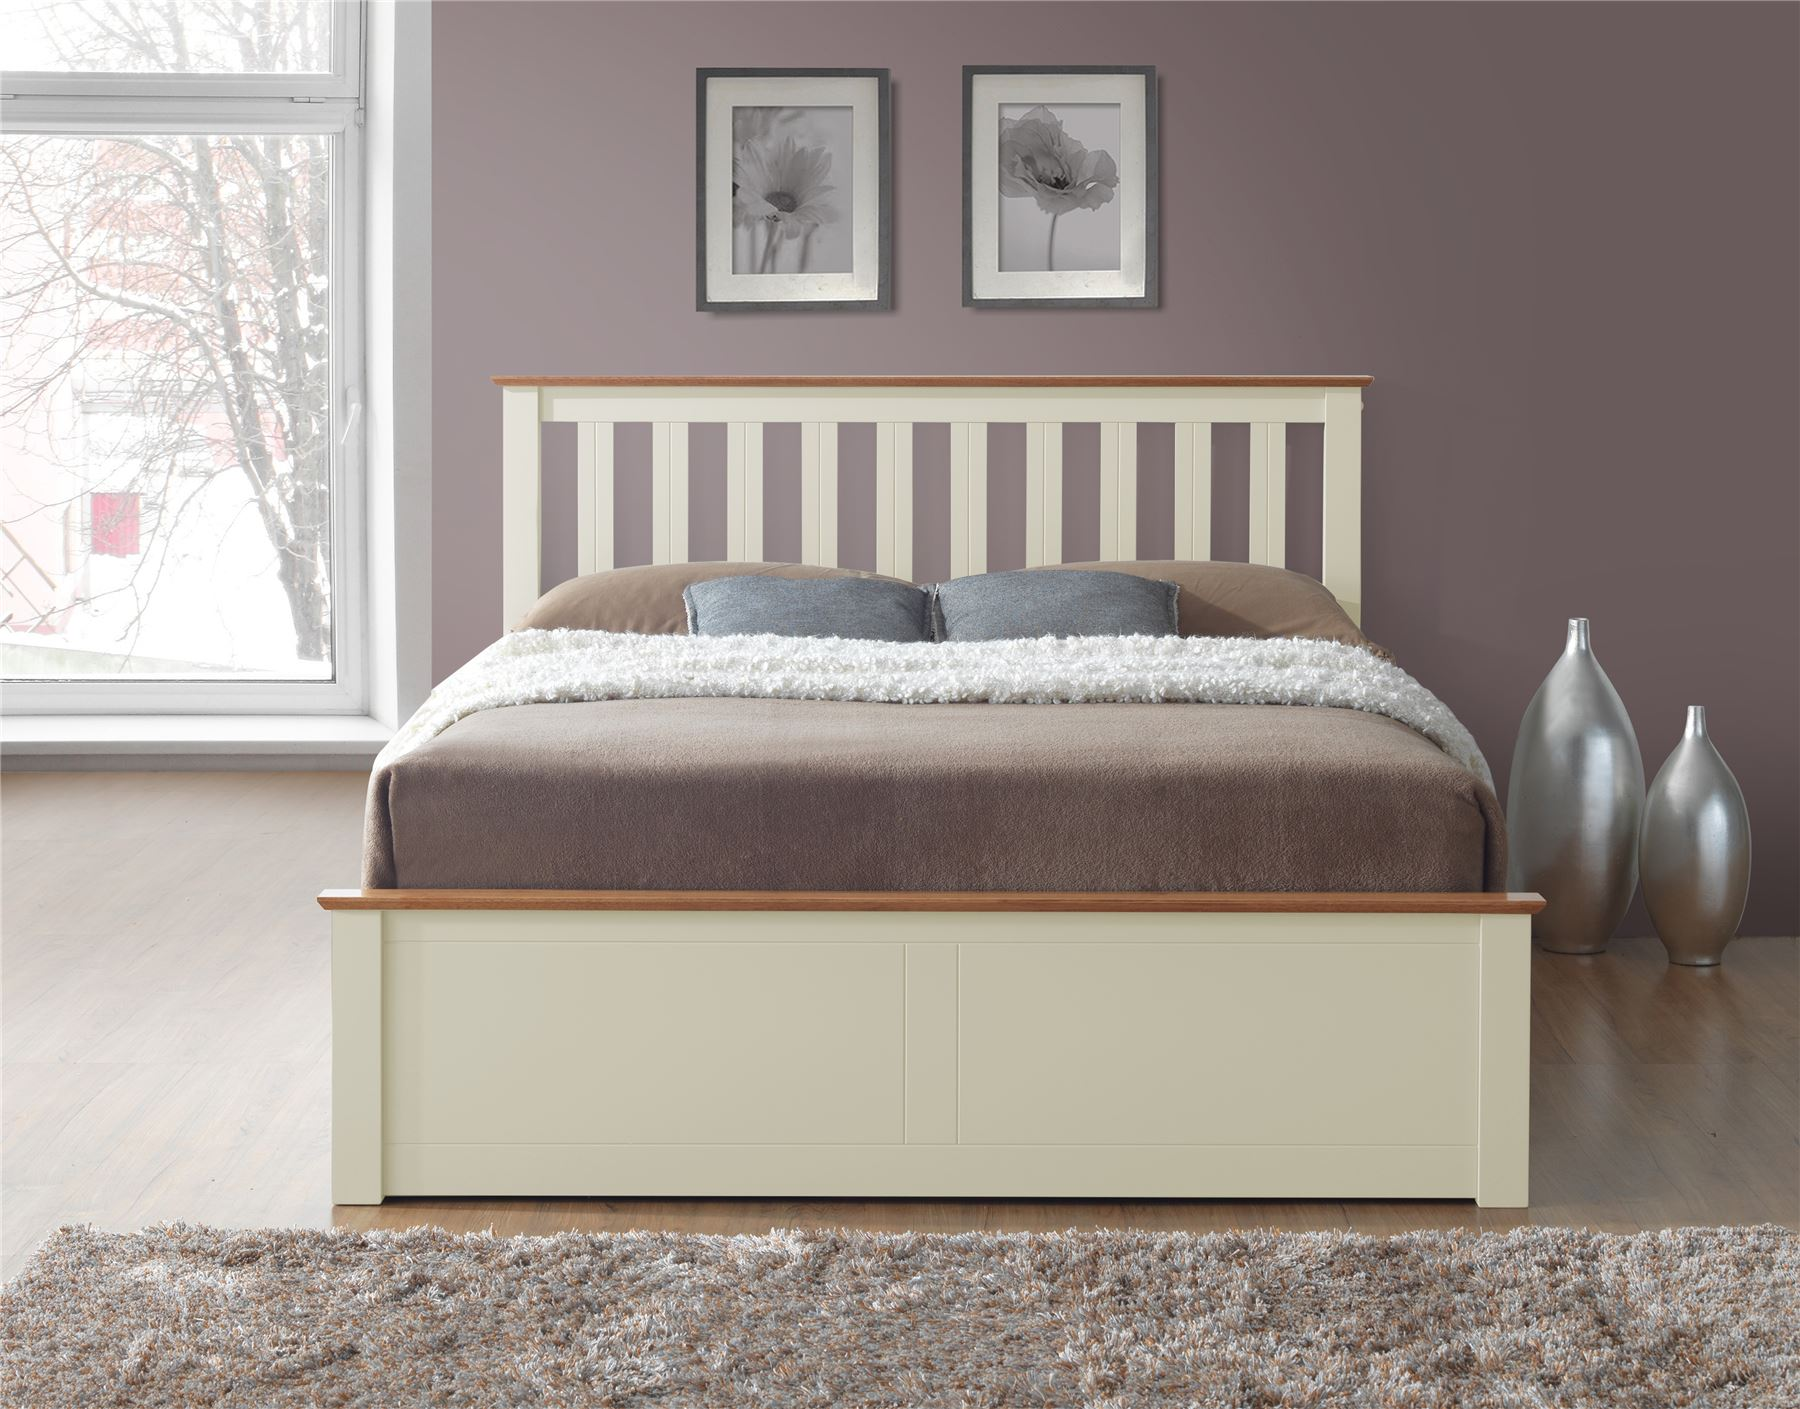 Phoenix Wood Ottoman Bed Frame Storage Double 4ft6 Cream